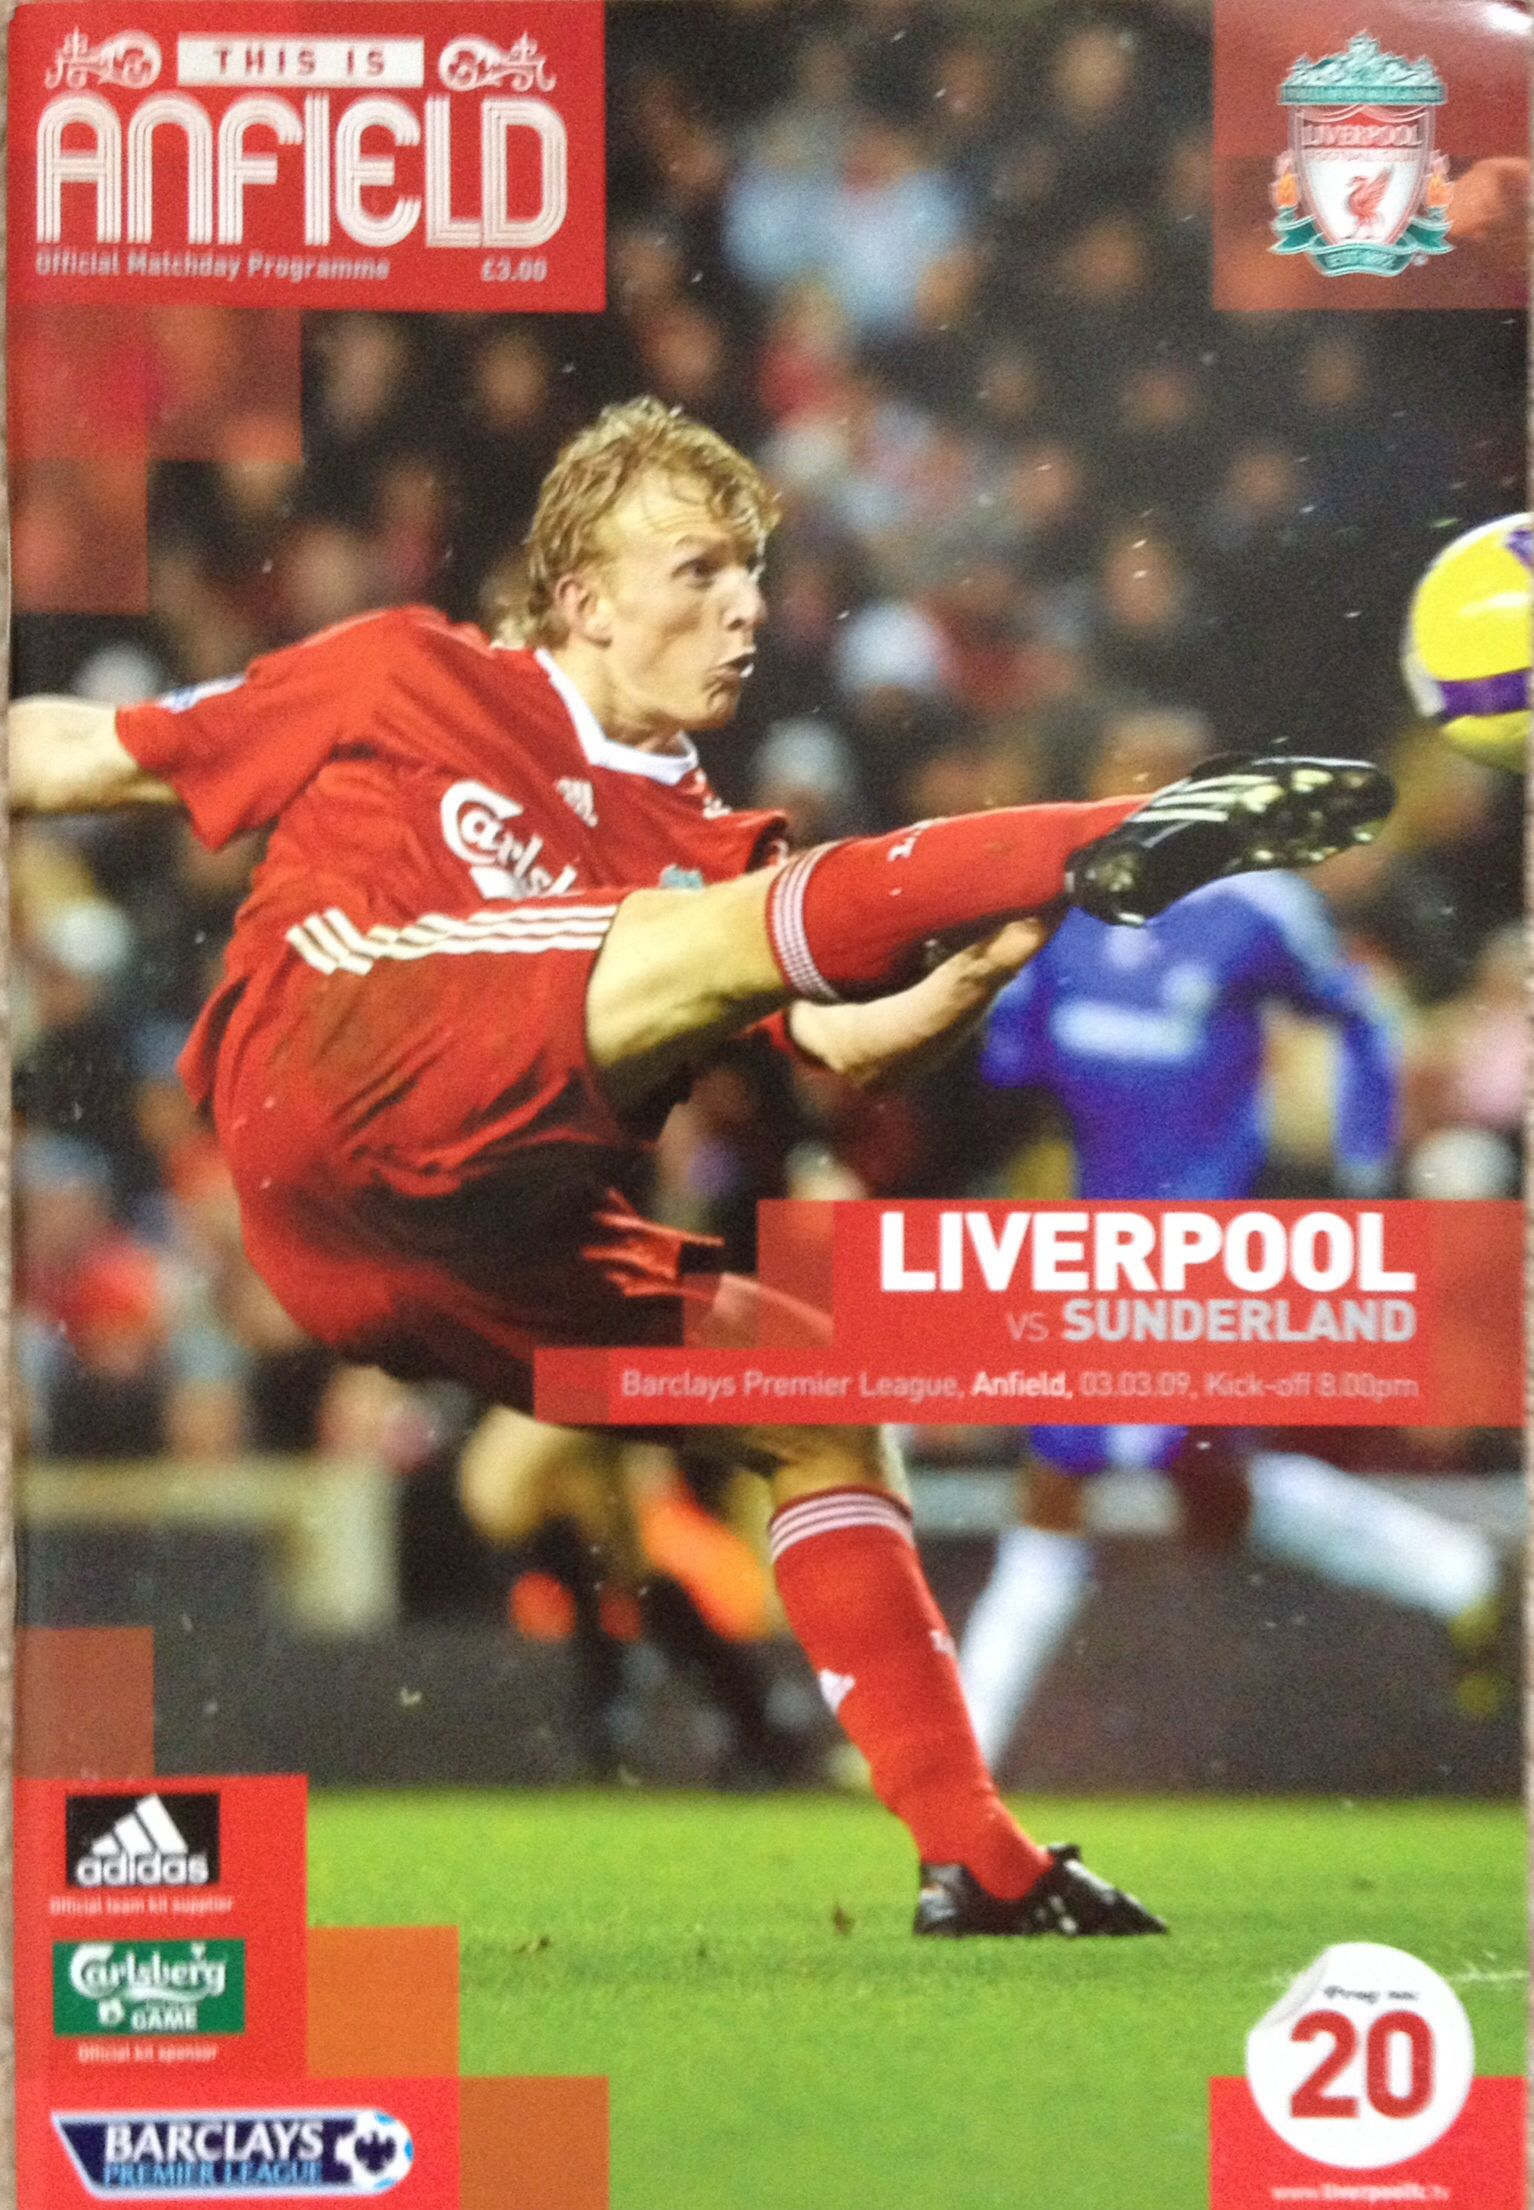 3/3/2009 Liverpool v Sunderland Football program